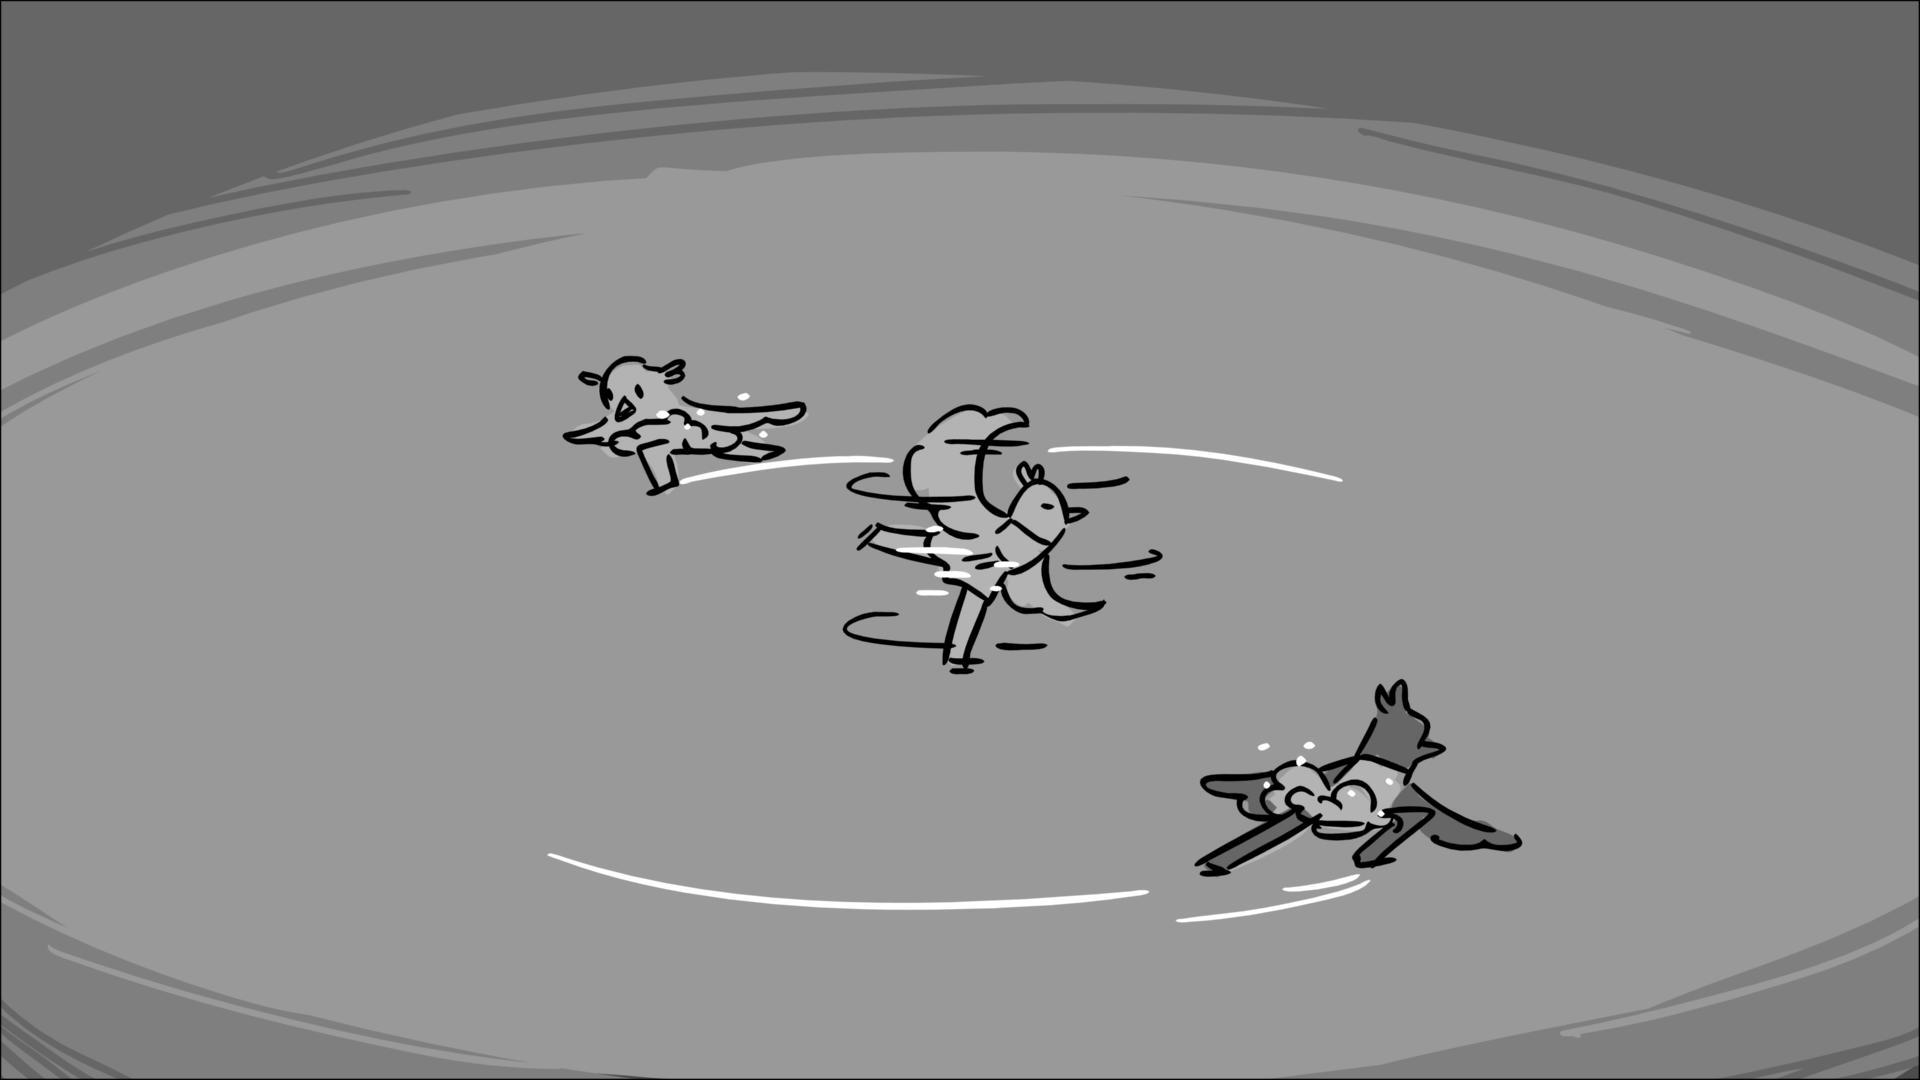 Blades of Furry-000005-02.jpg